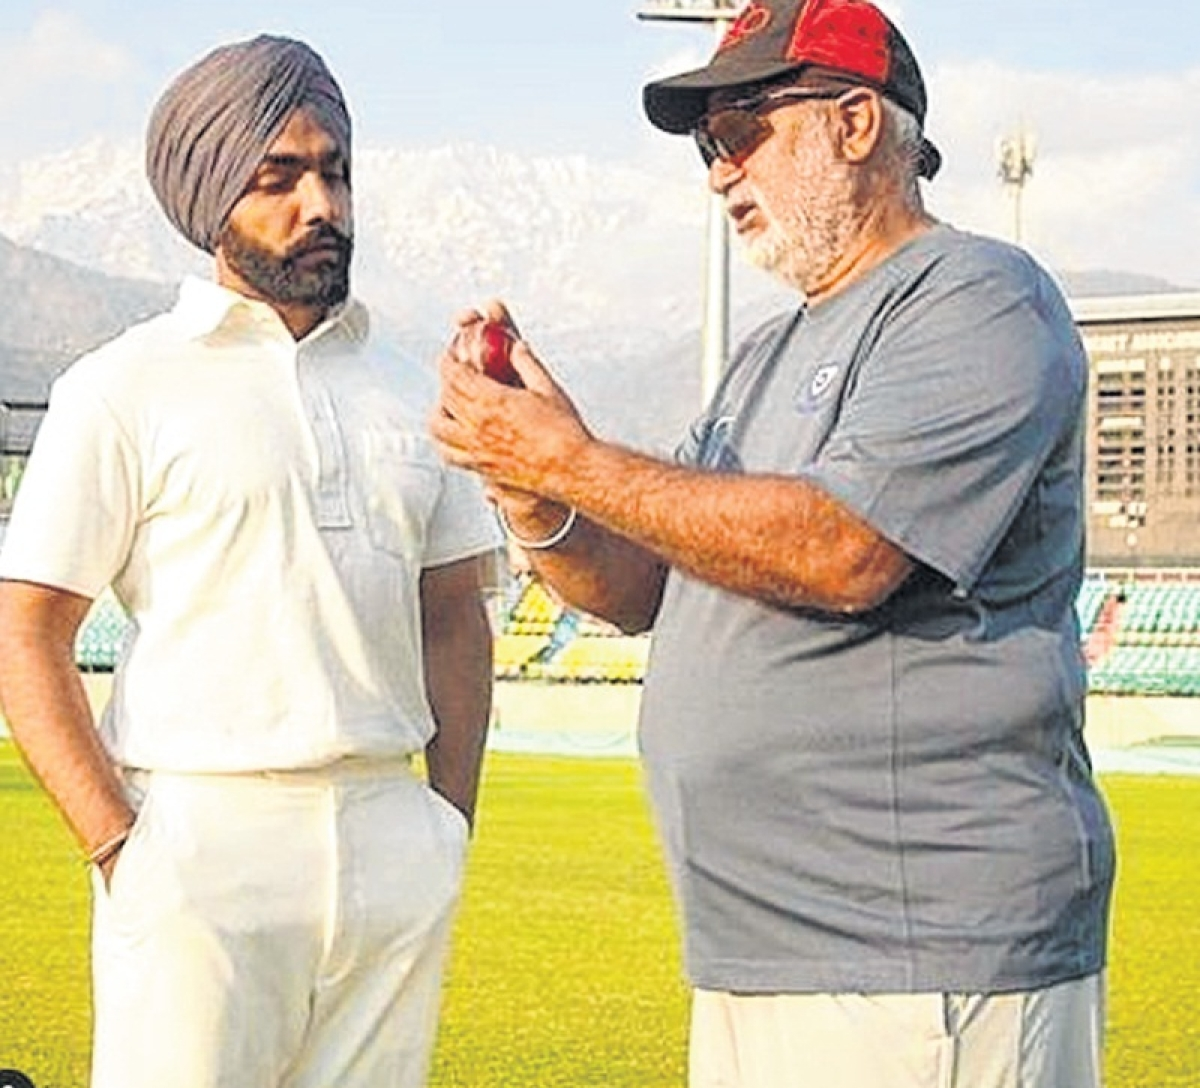 India's best chance to win this year: Balwinder Singh Sandhu